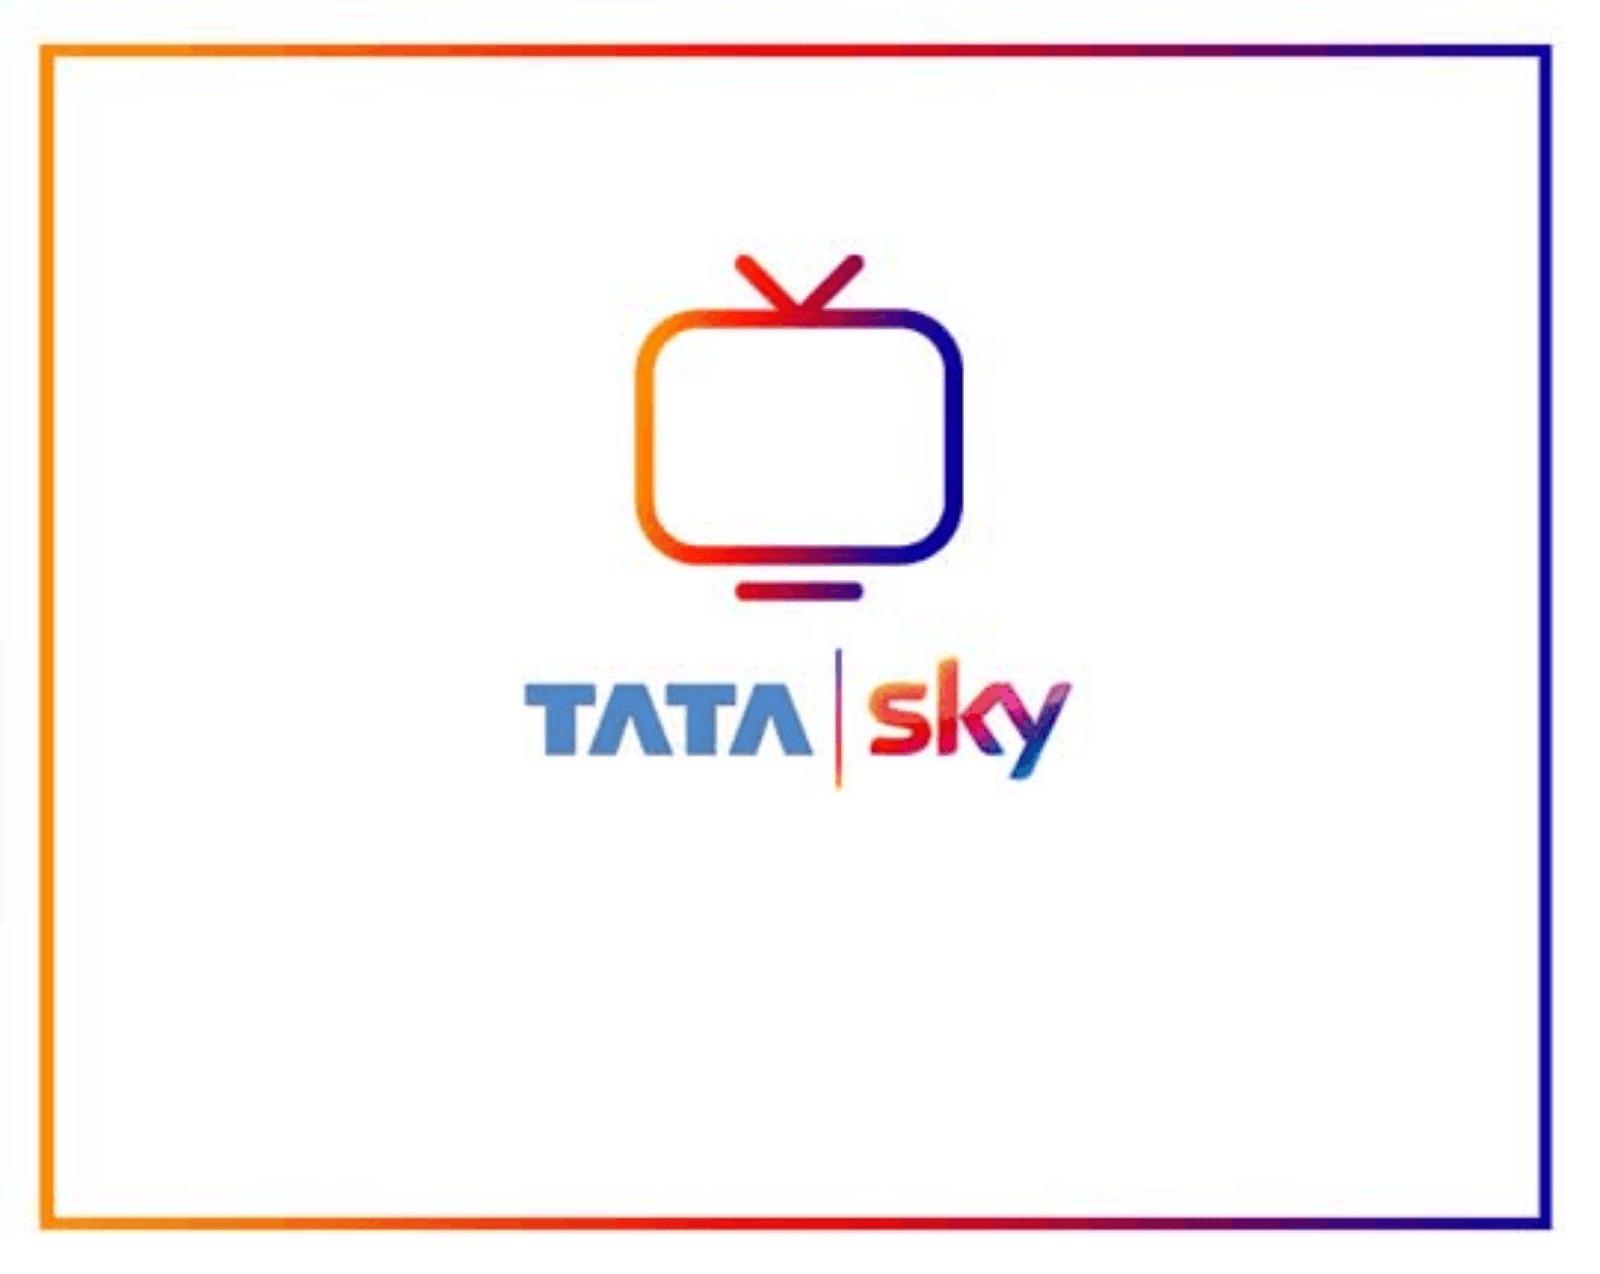 Tata-Sky-graphic-logo